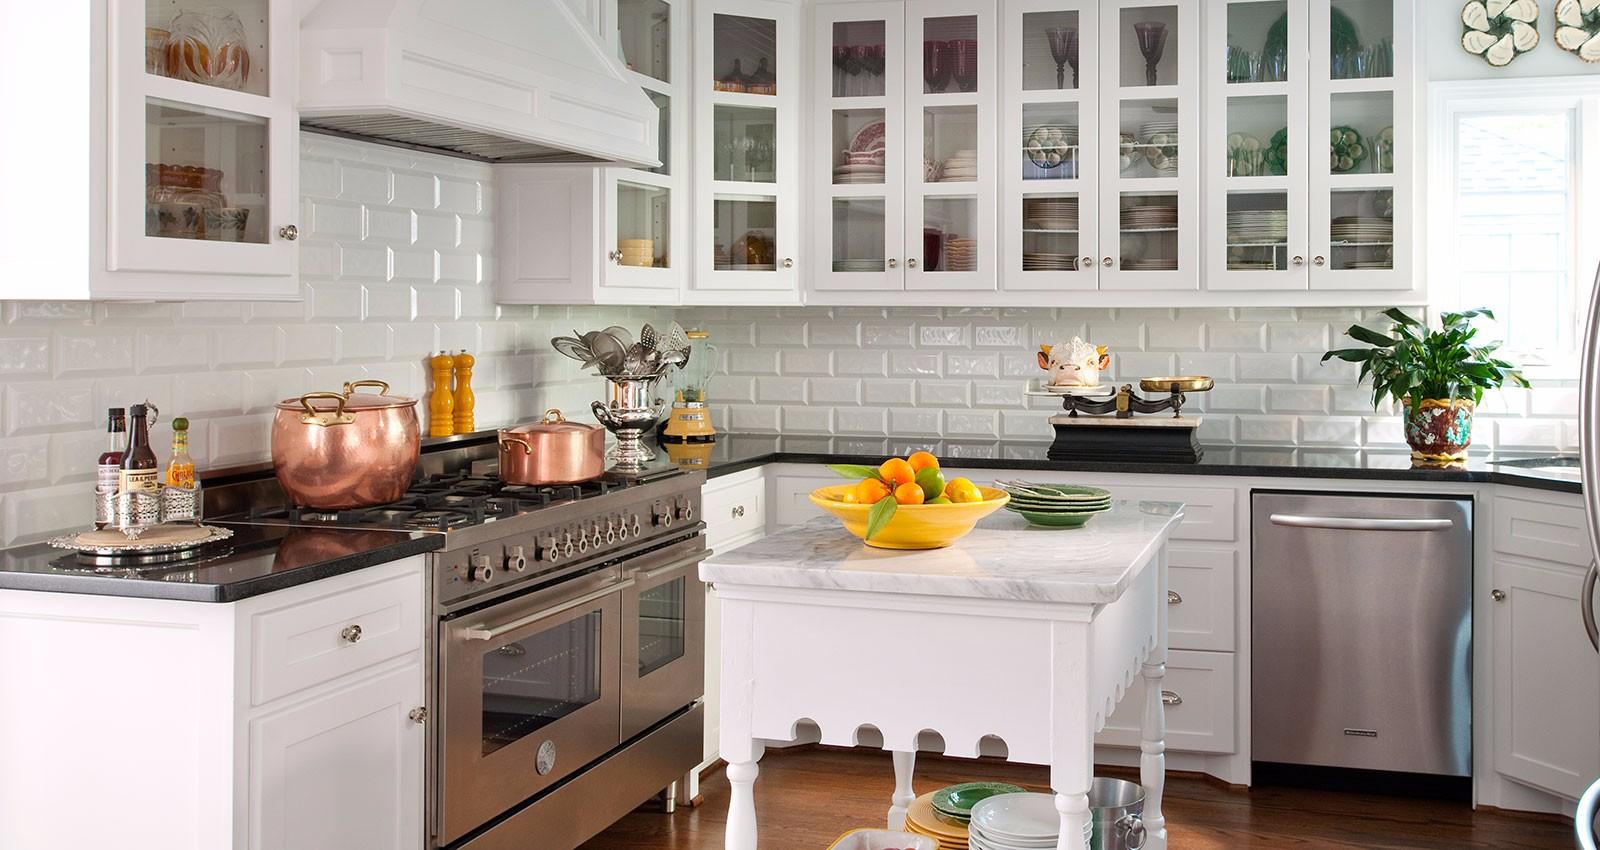 Pam Kelley Design - Kitchens